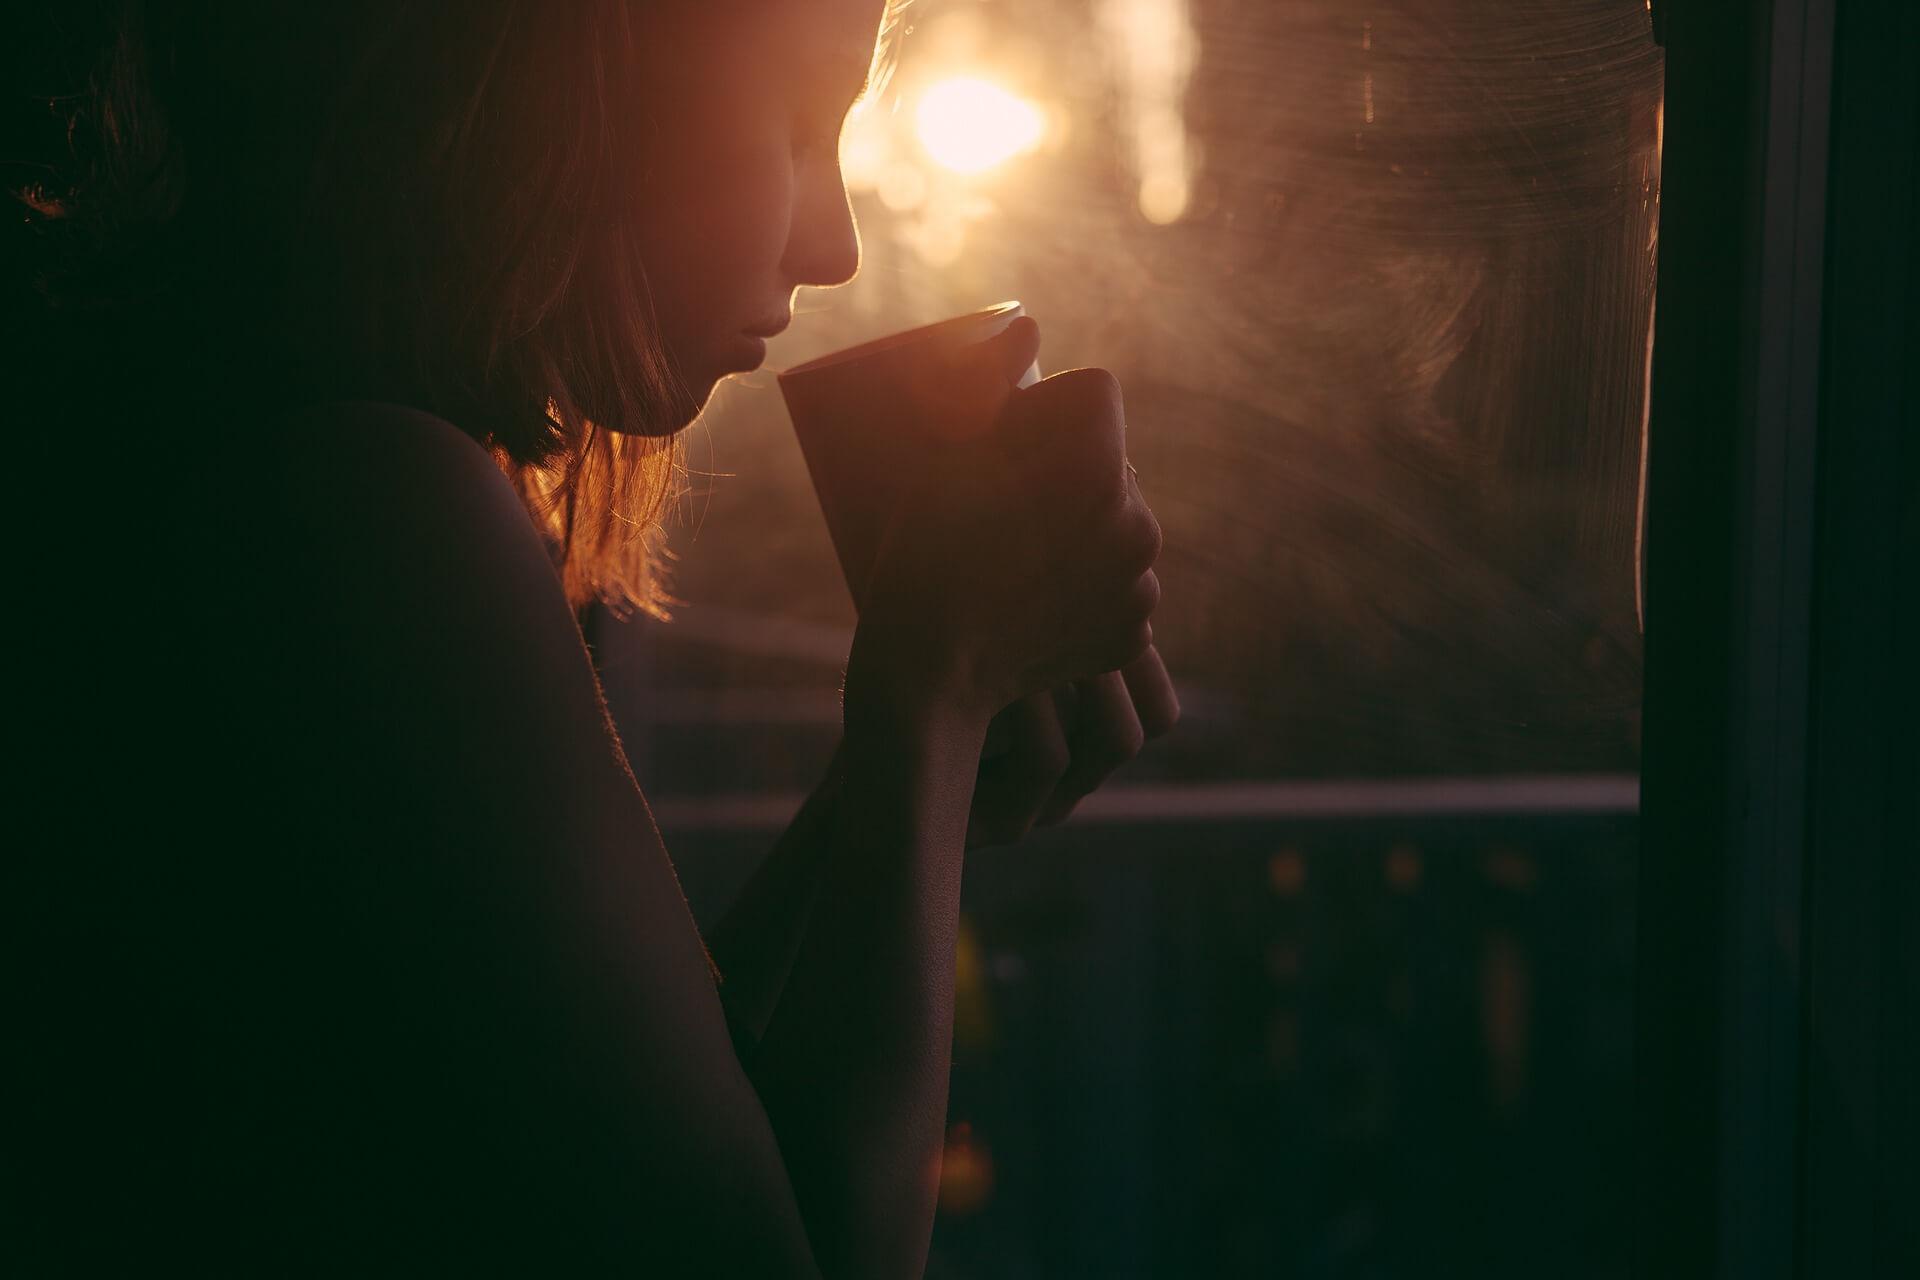 mujer-cafe-calma-bienestar